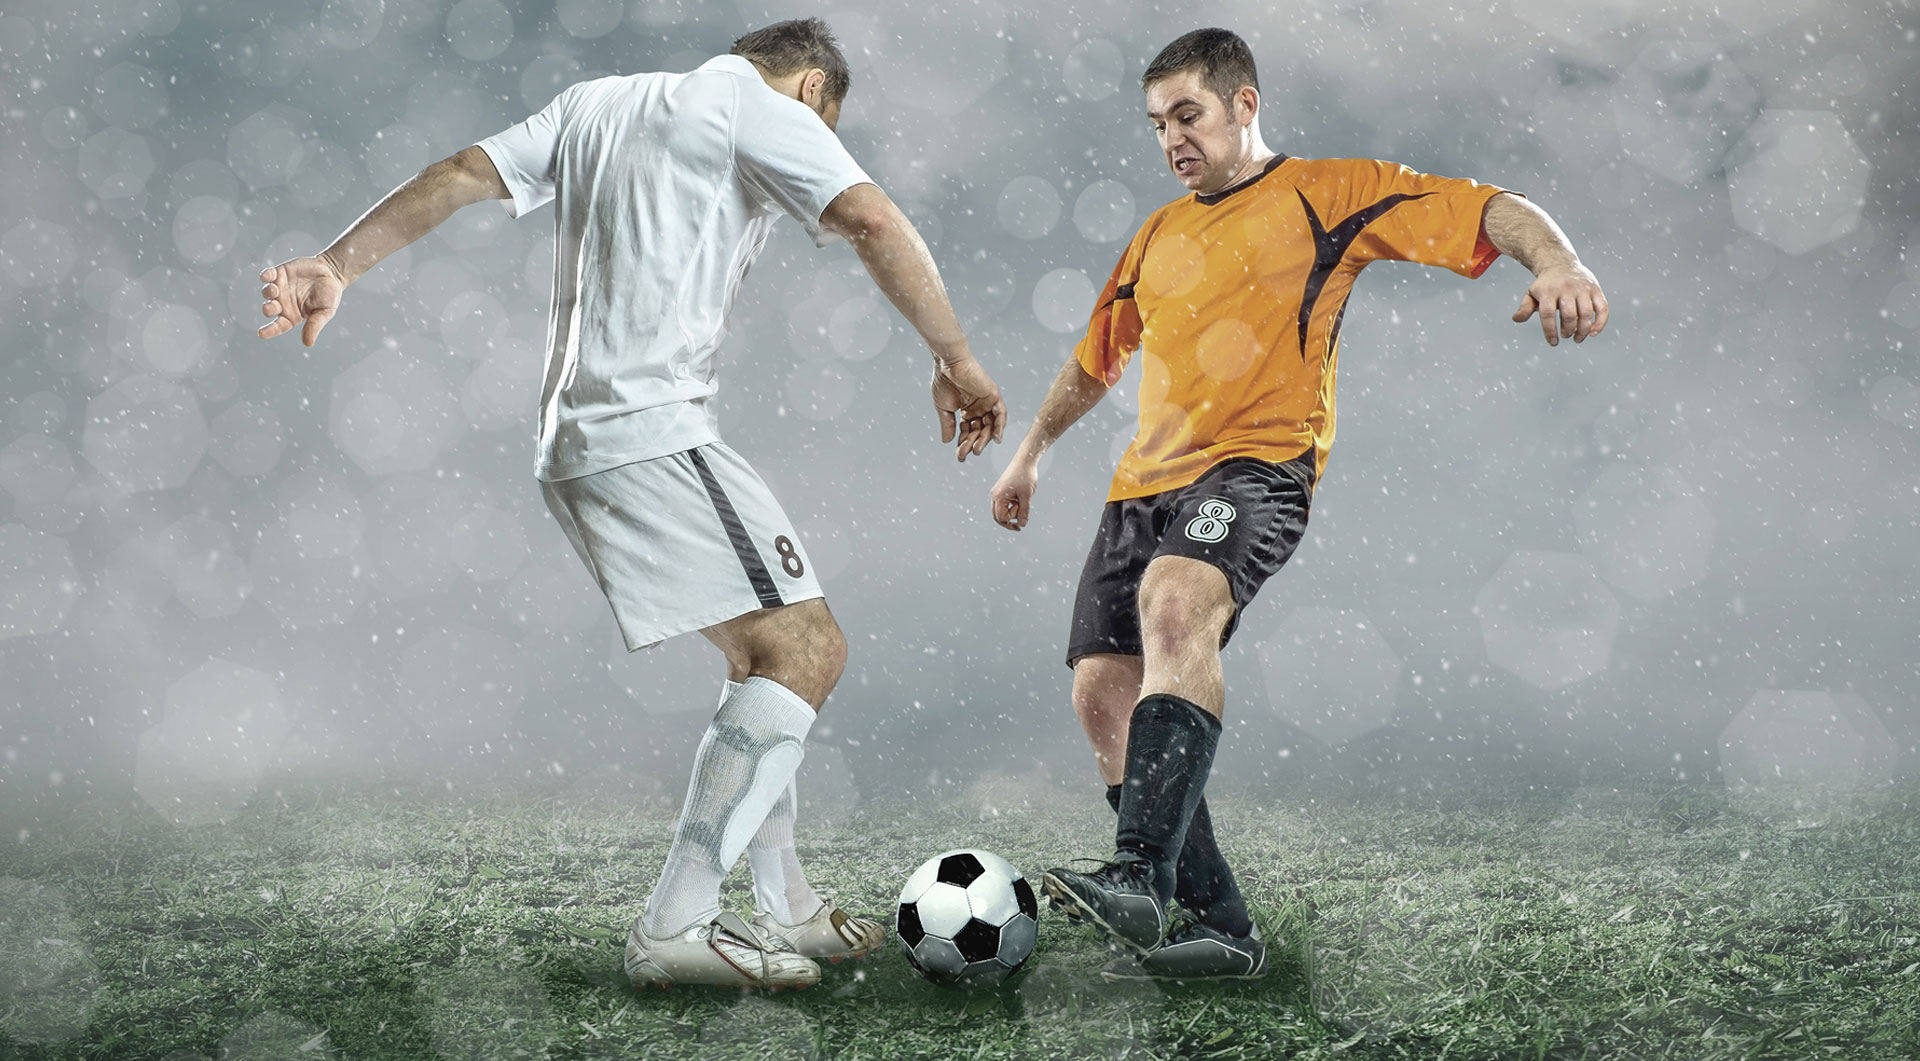 watch-bosnia-and-herzegovina-vs-poland-davis-cup-live